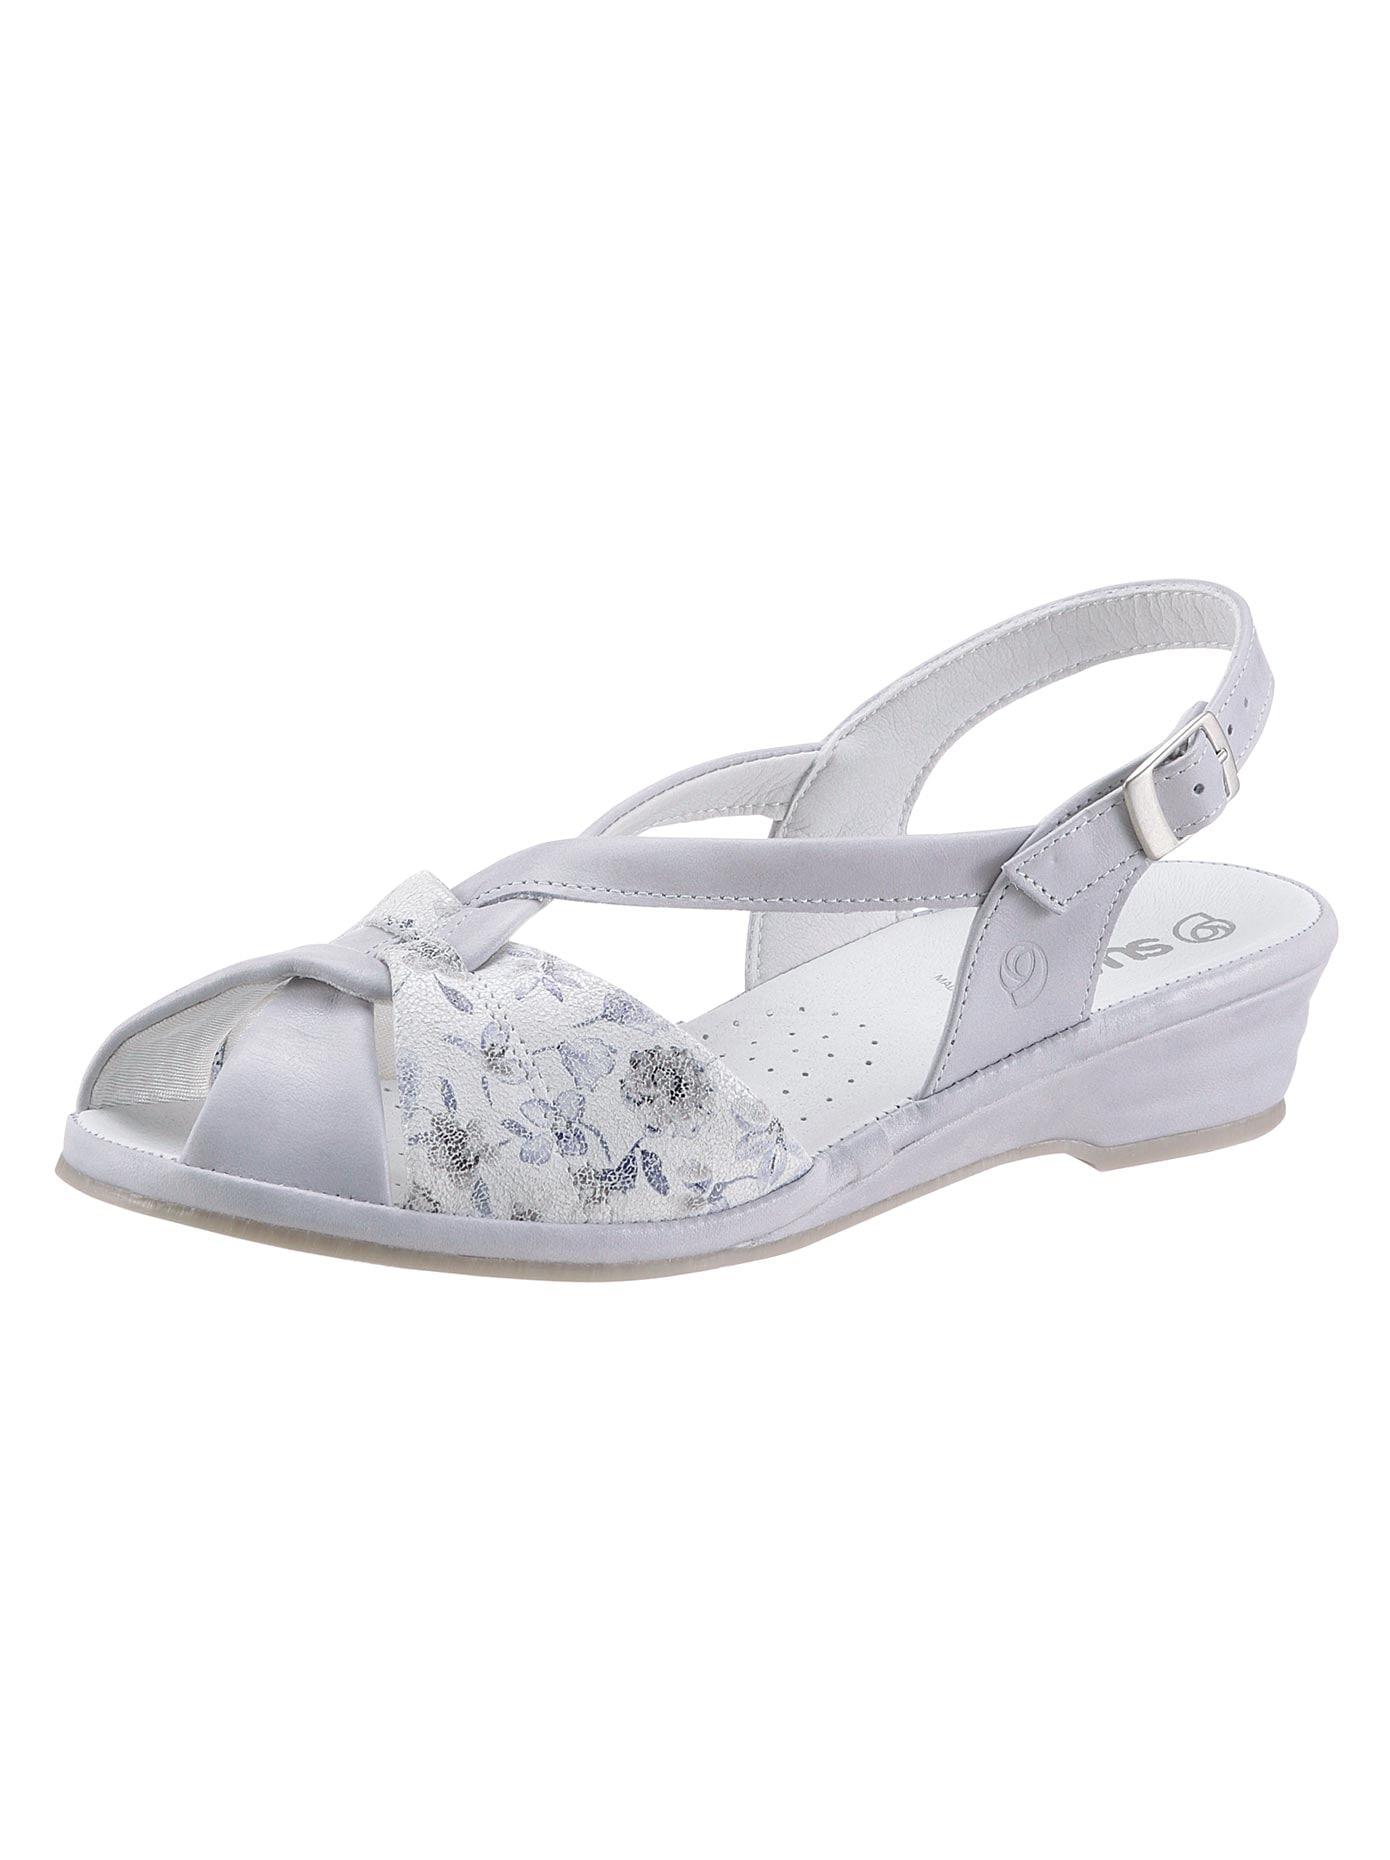 Suave Sandalette grau Damen Sandaletten Sandalen